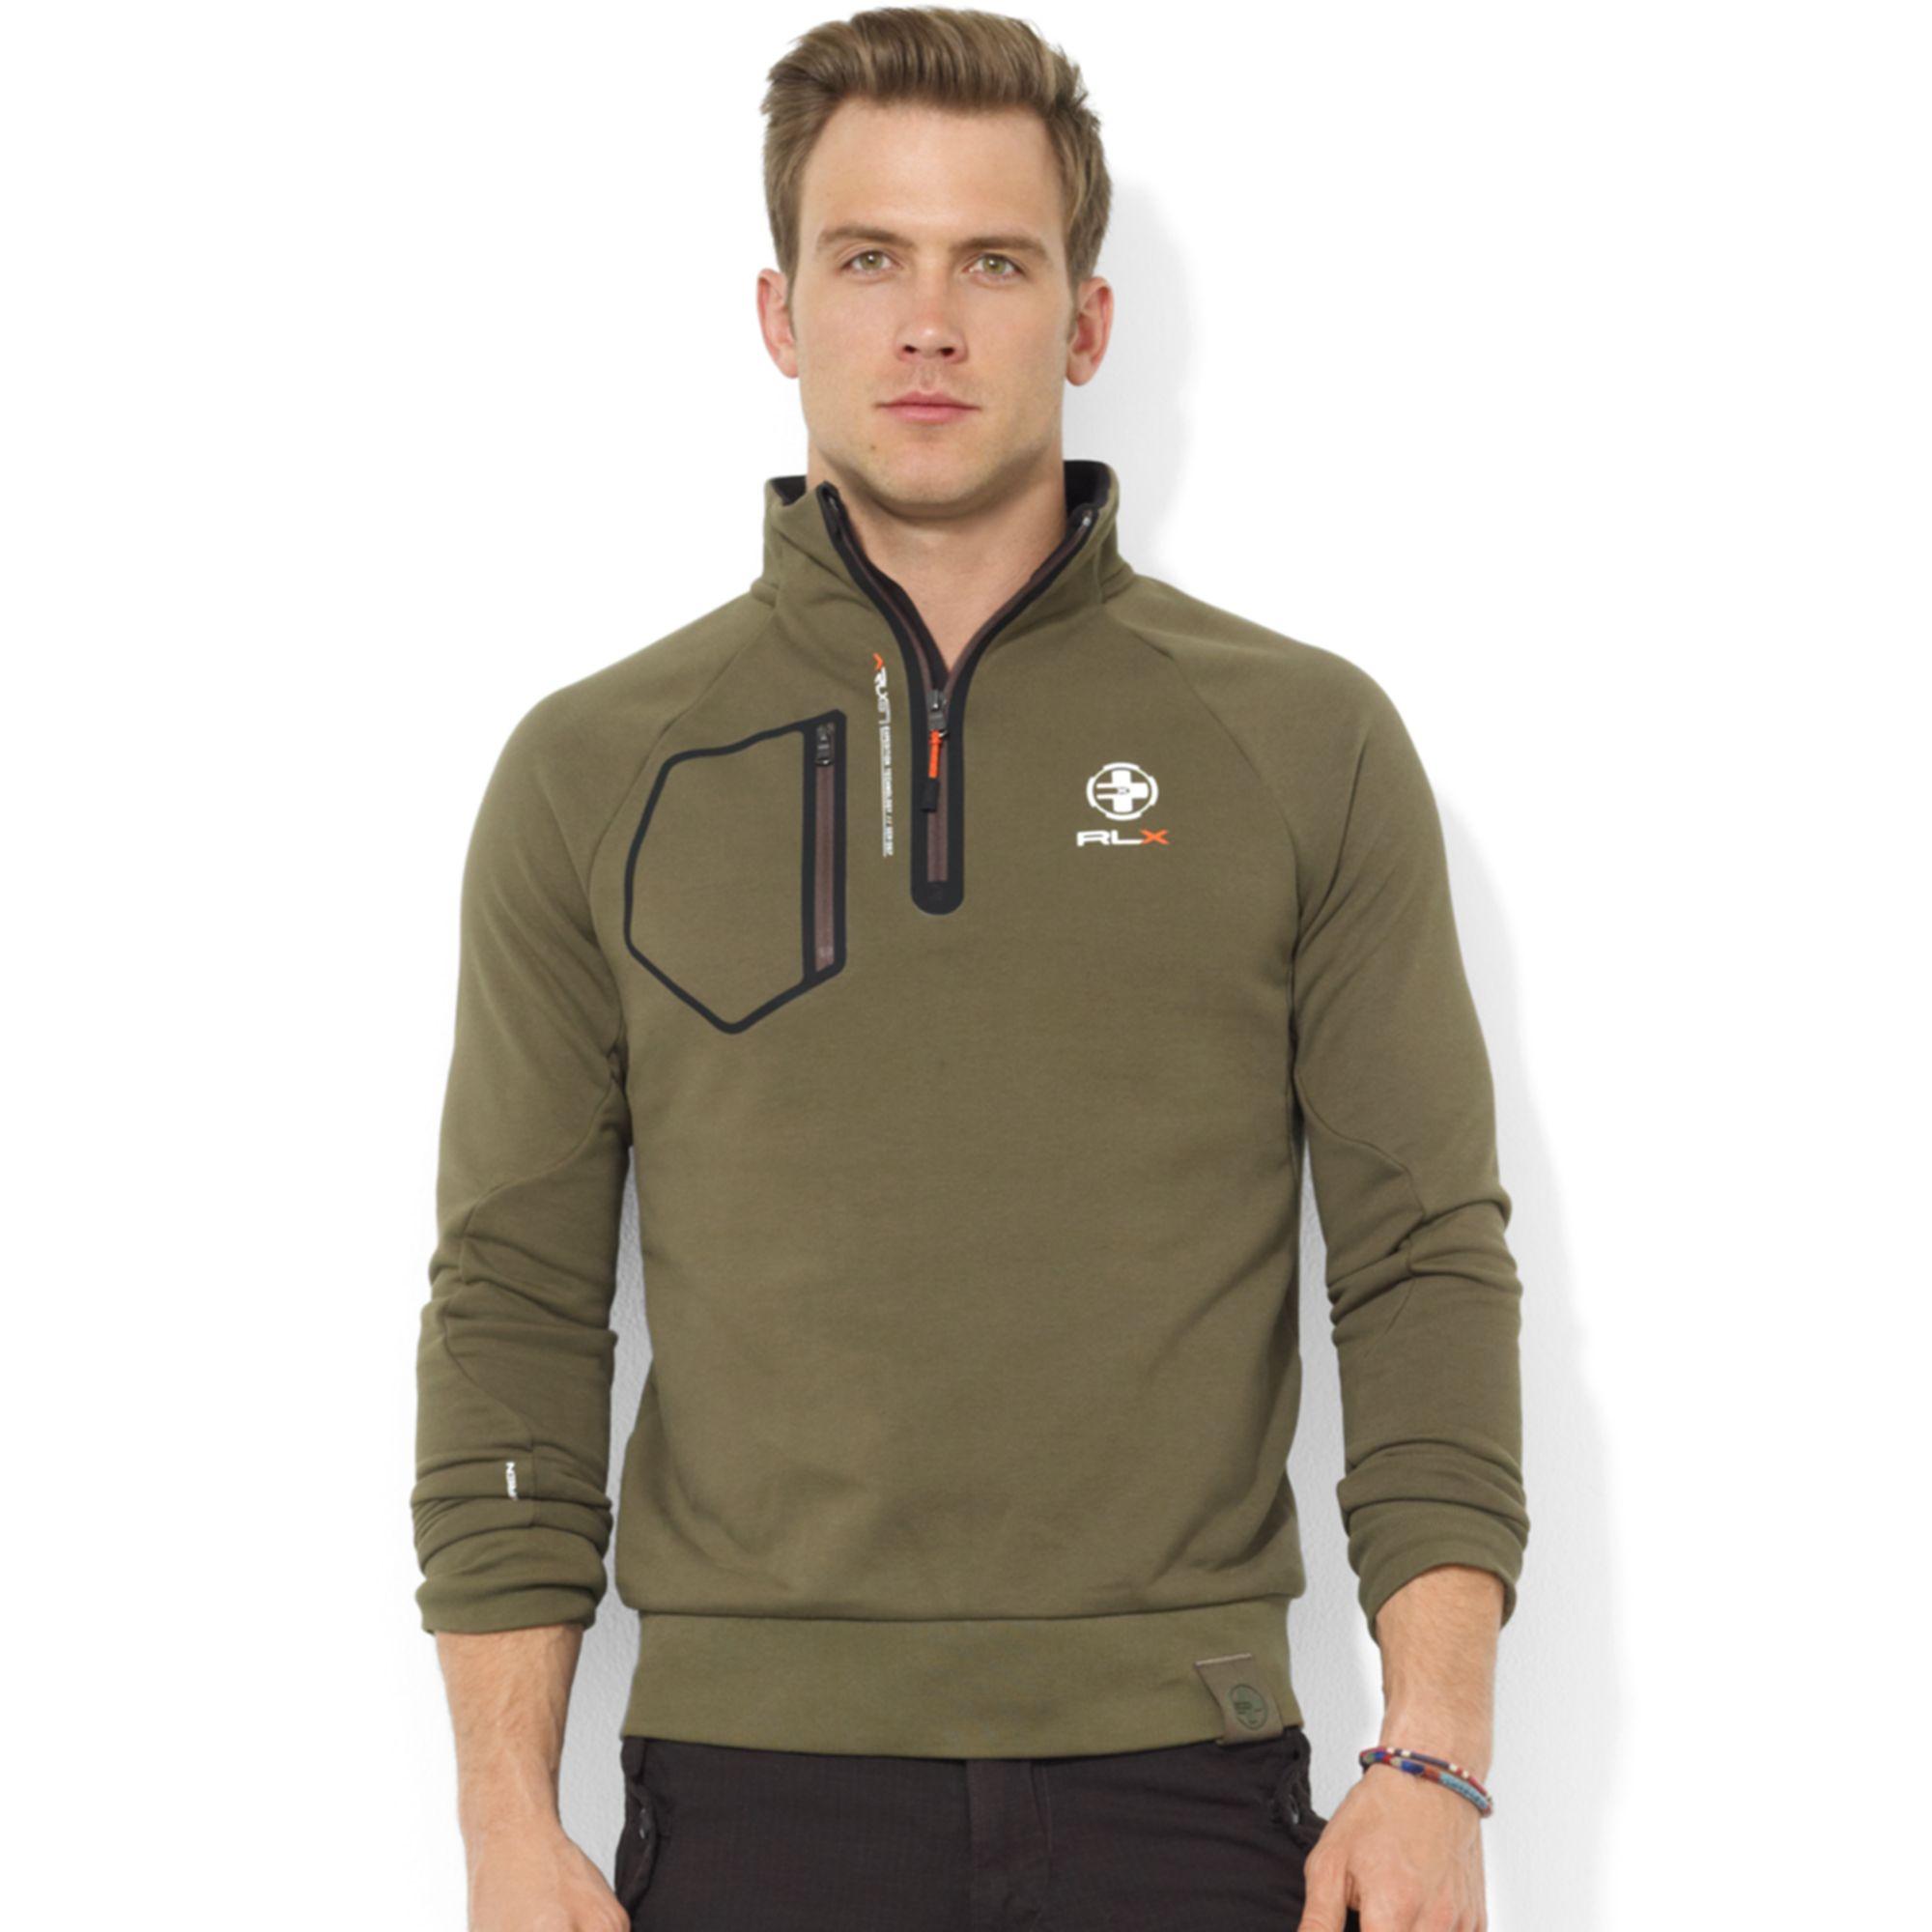 Adidas Mens Light Fleece Jacket Size Large L Black